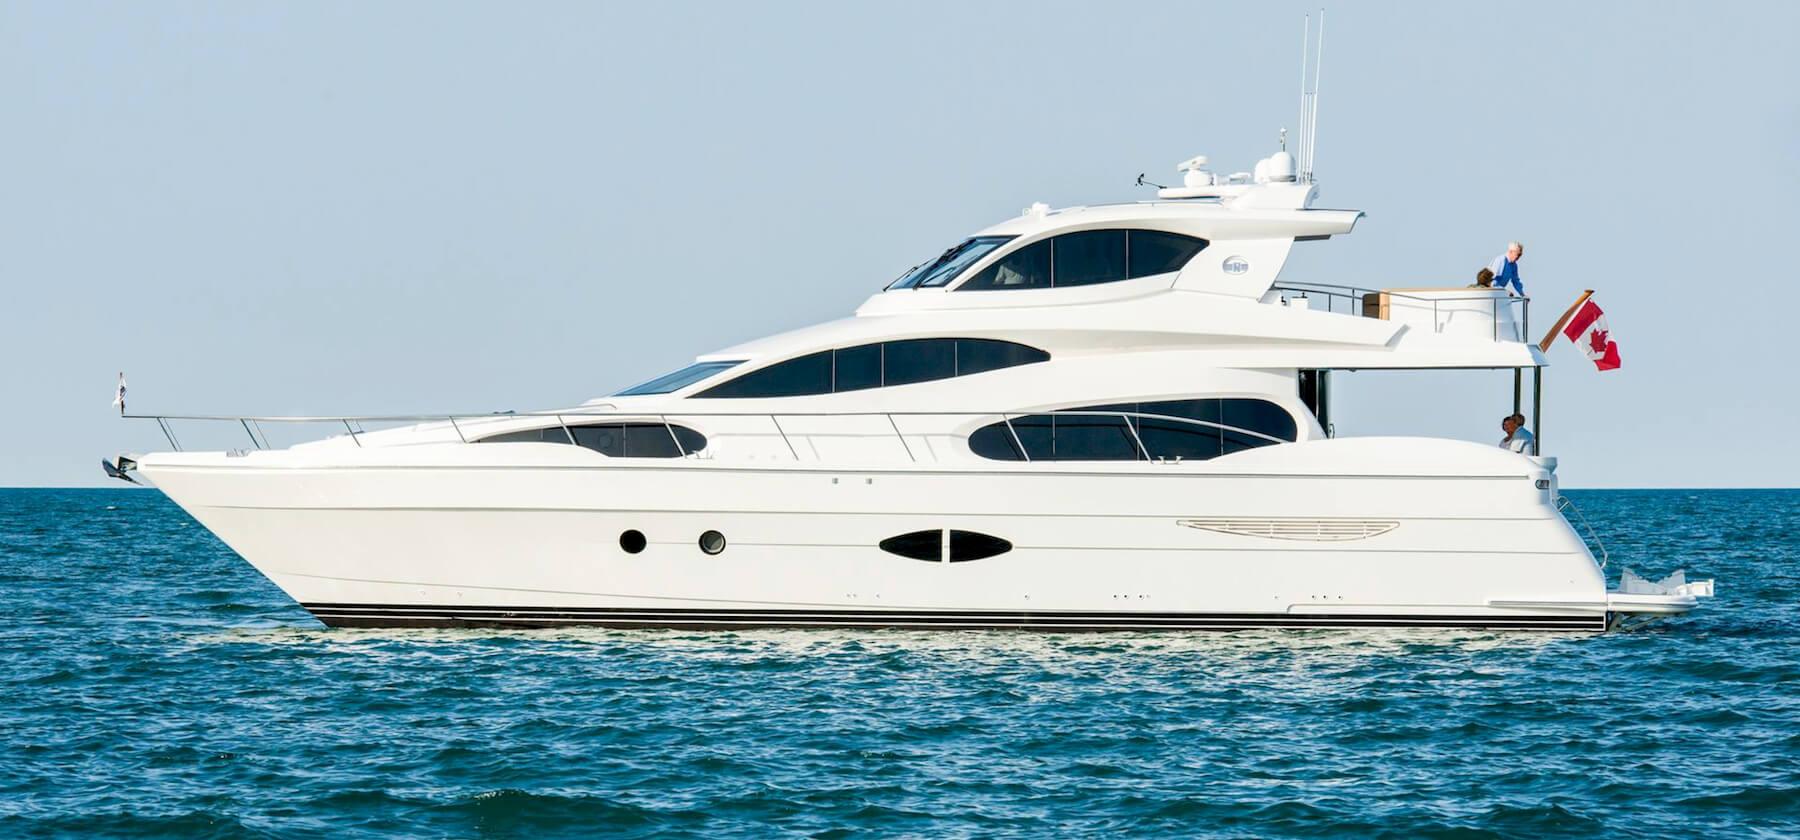 Neptunus yachts for sale